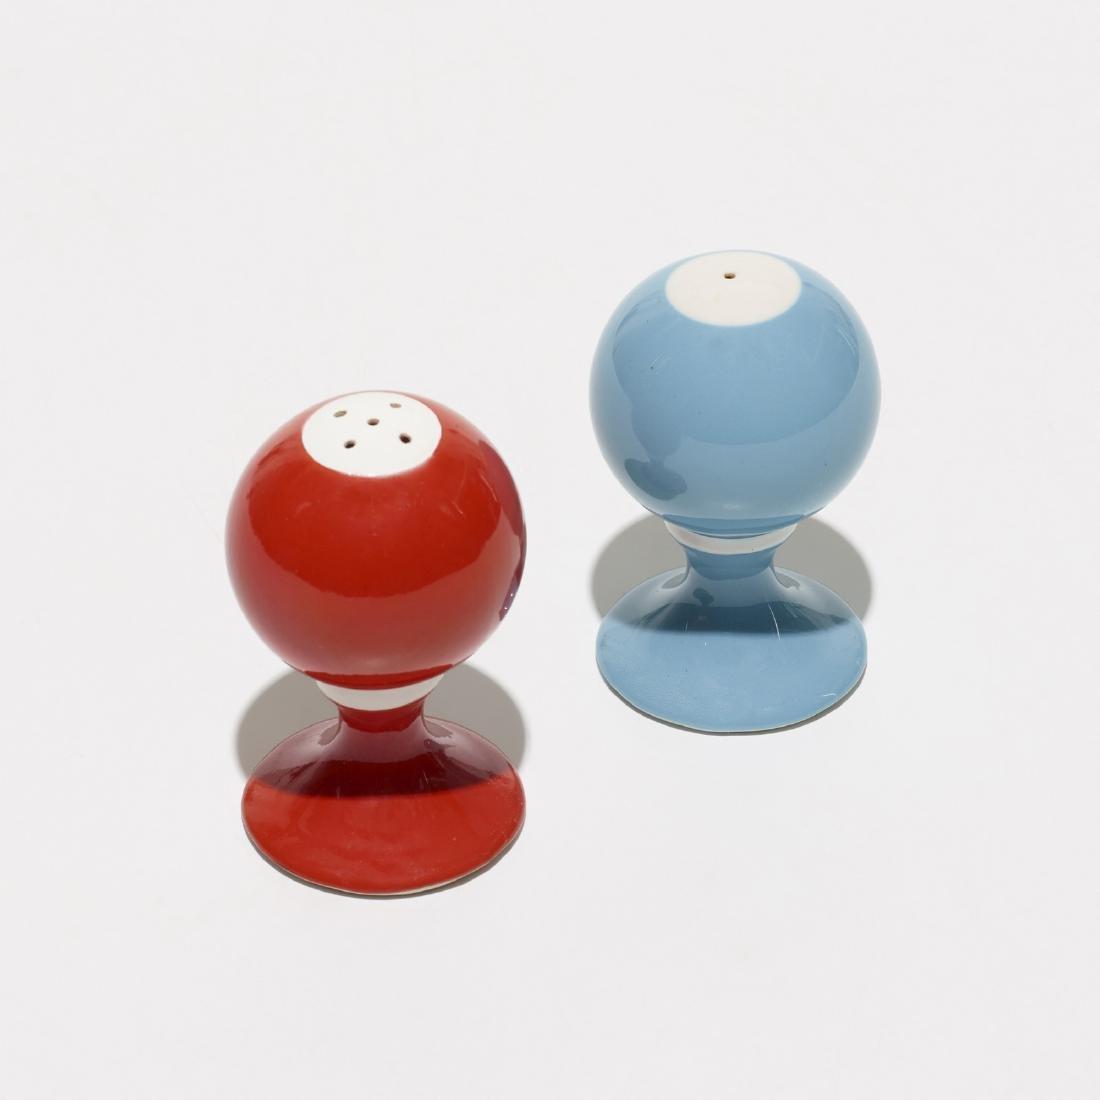 Girard, 2 salt and pepper shakers, La Fonda del Sol - 2